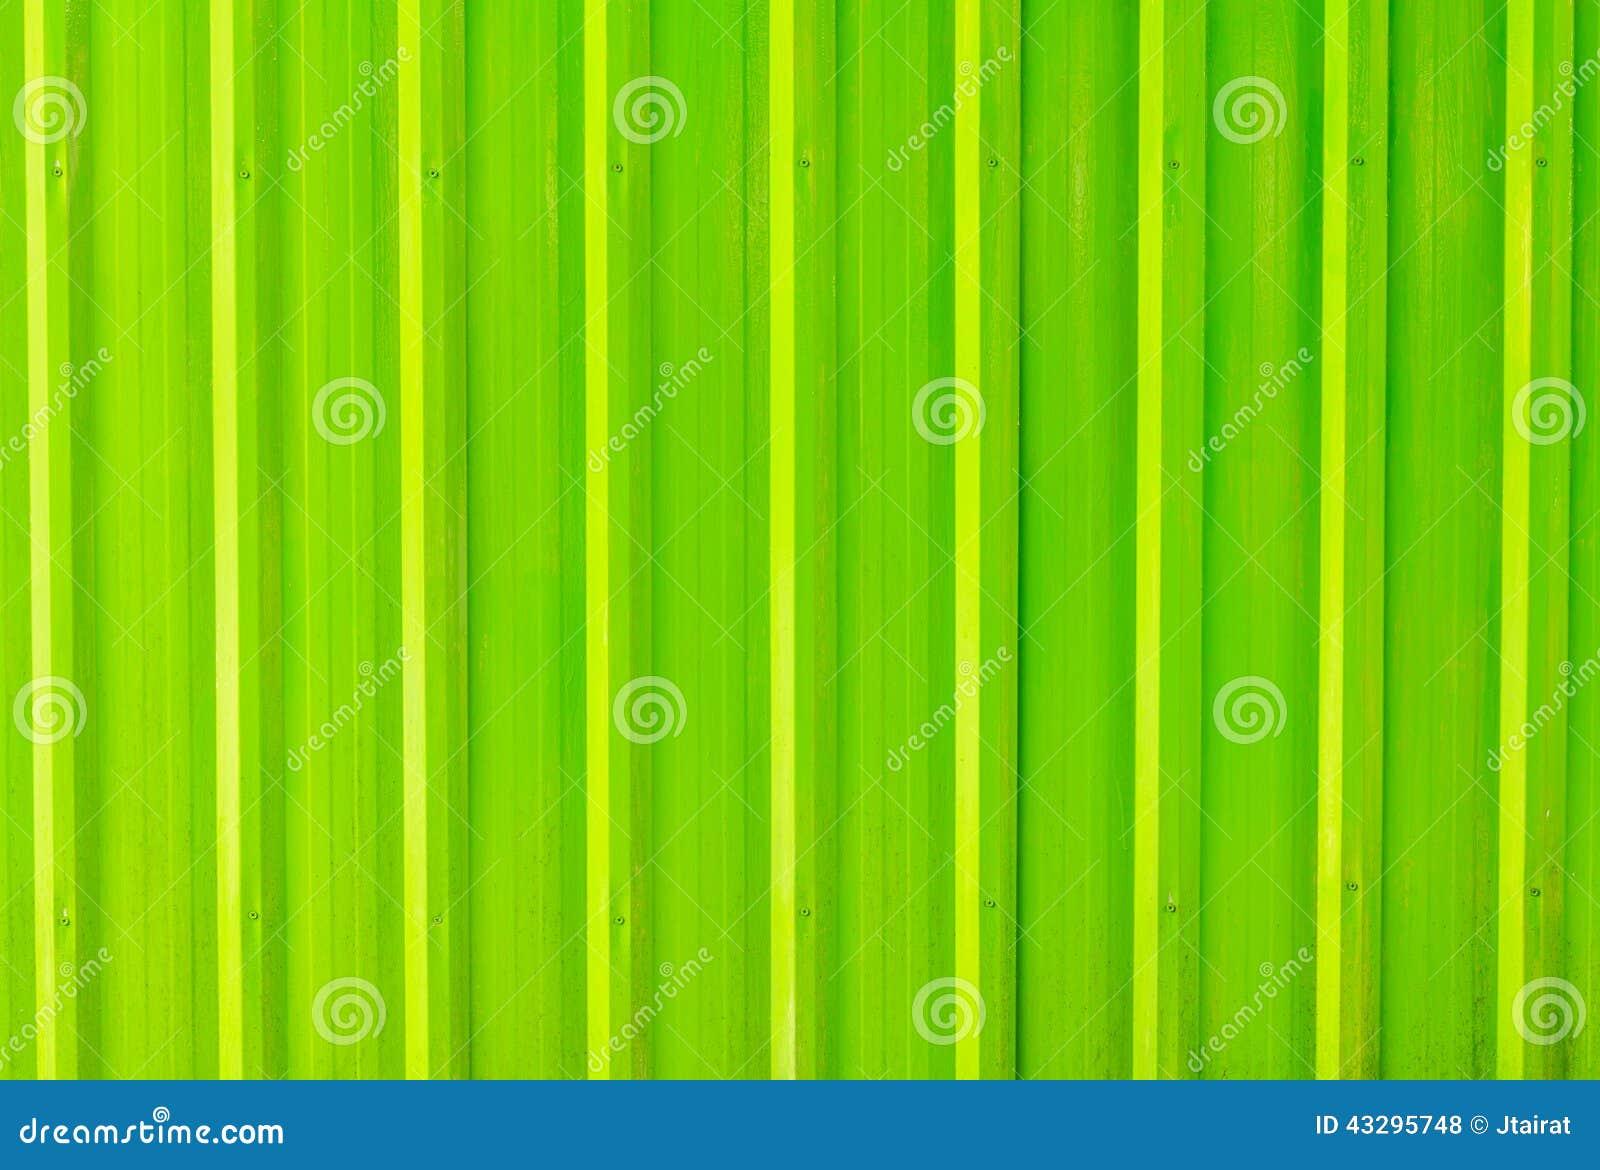 Fondo sucio de la cerca verde